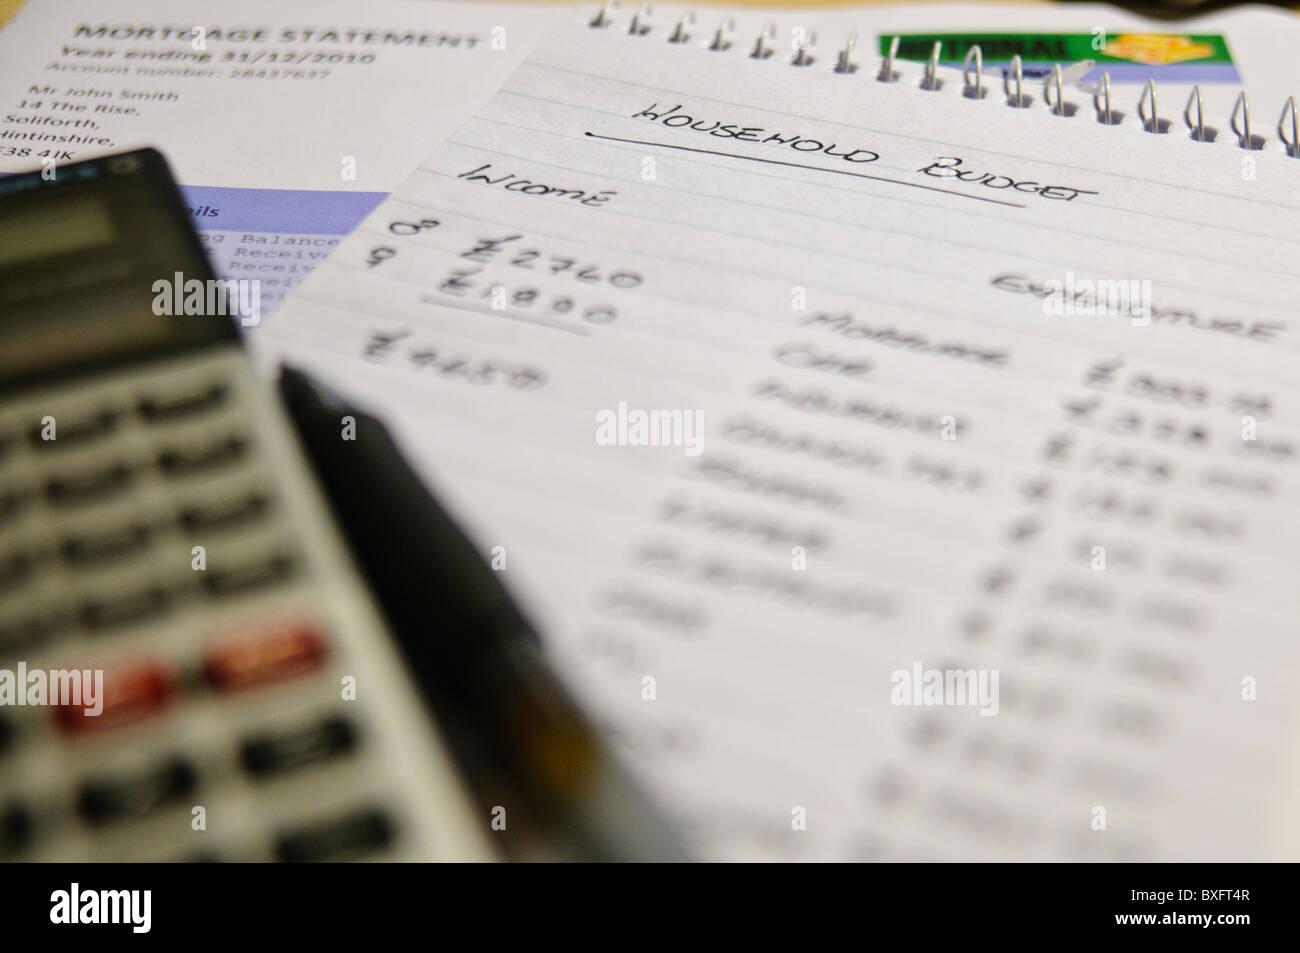 household budget calculators - Winkd.co